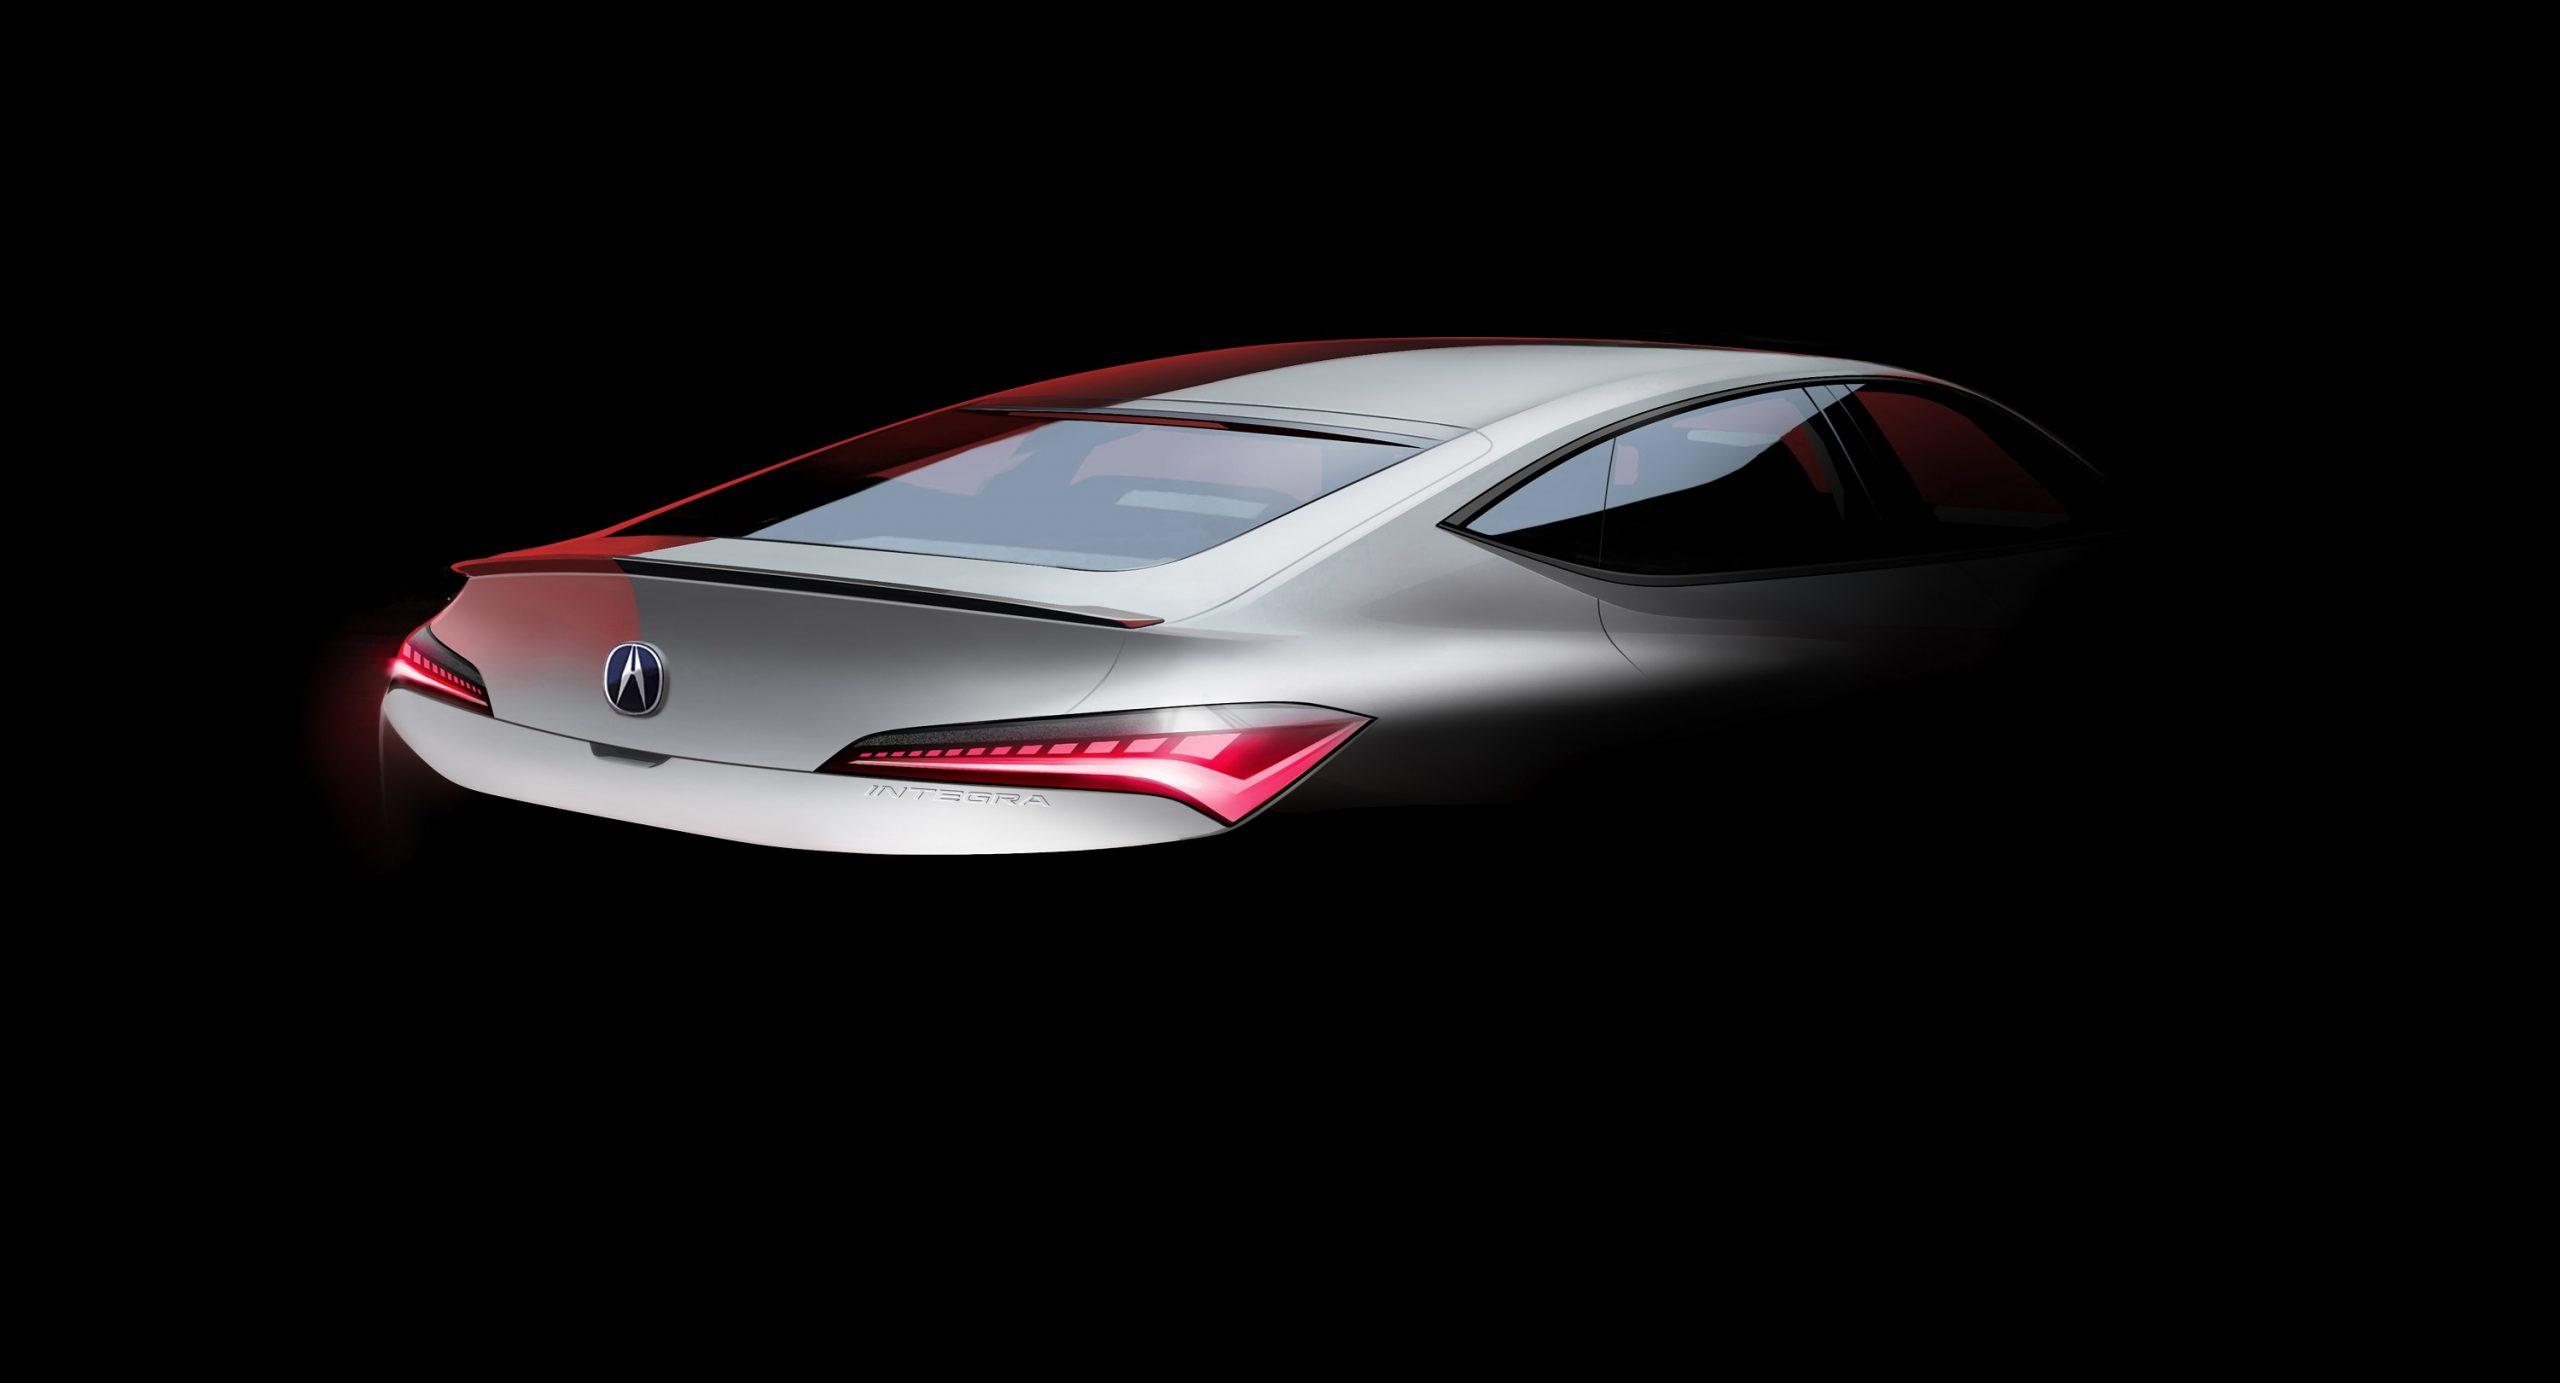 The rear of a white 2022 Acura Integra